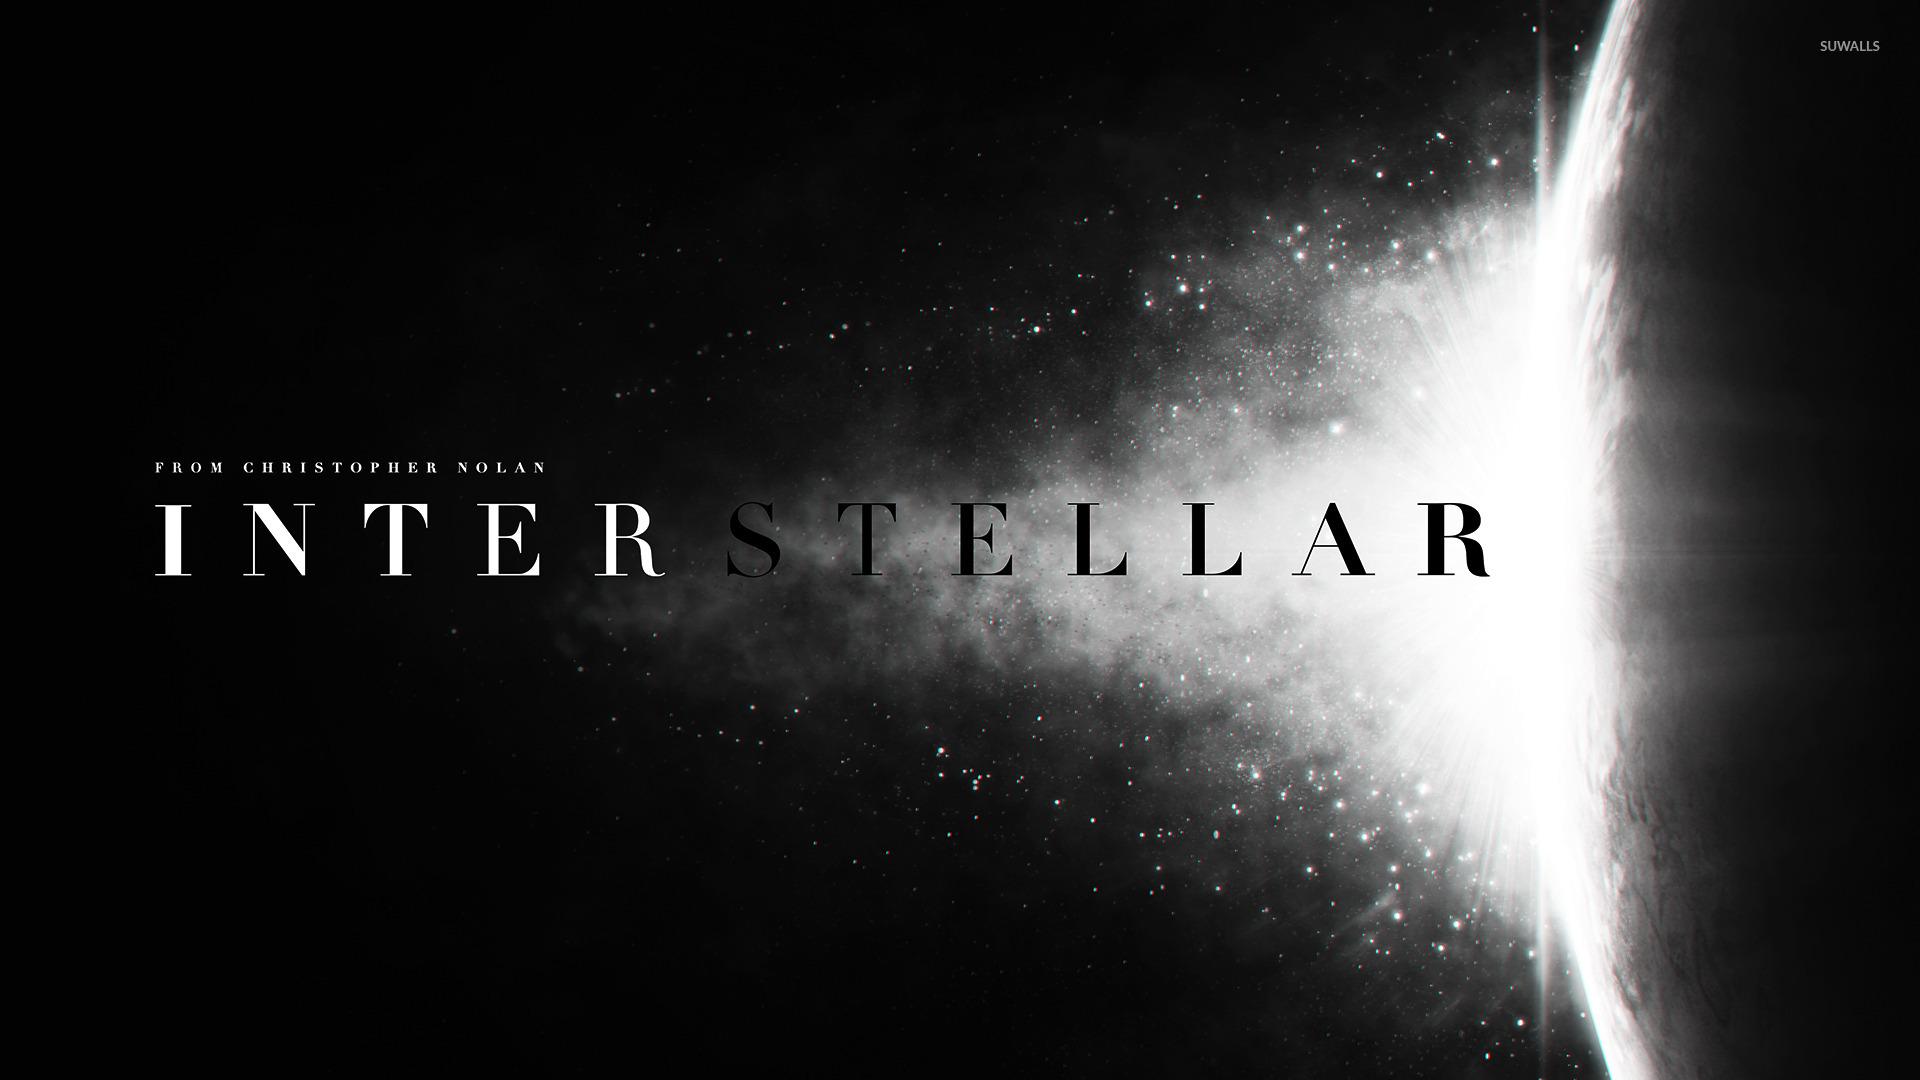 Interstellar wallpaper - Movie